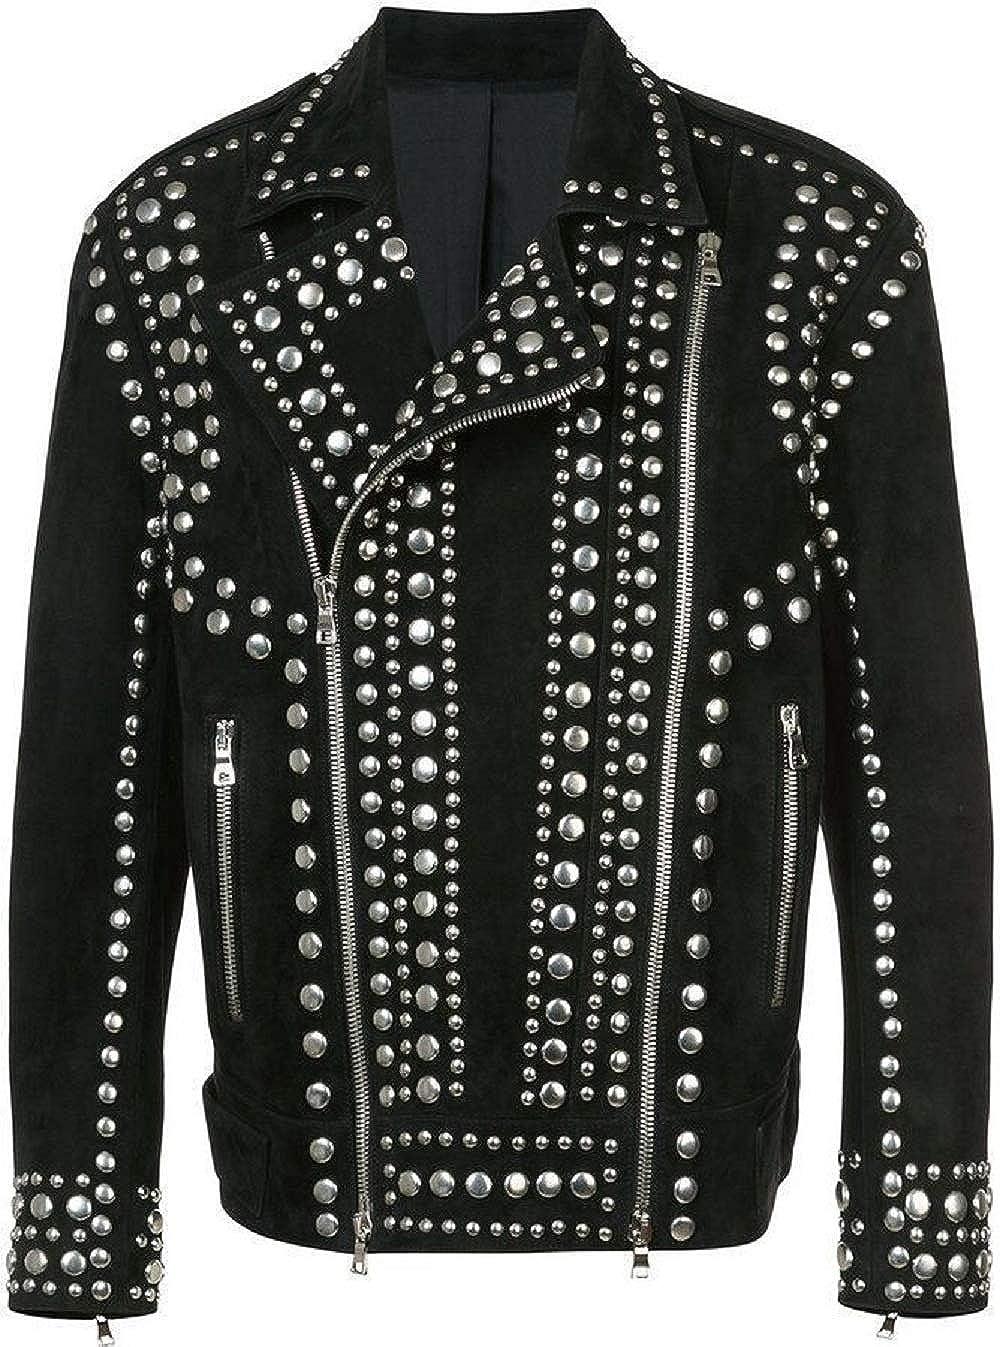 Mens Brando Studded Punk Rock Motorcycle Black Spike Suede Leather Jacket